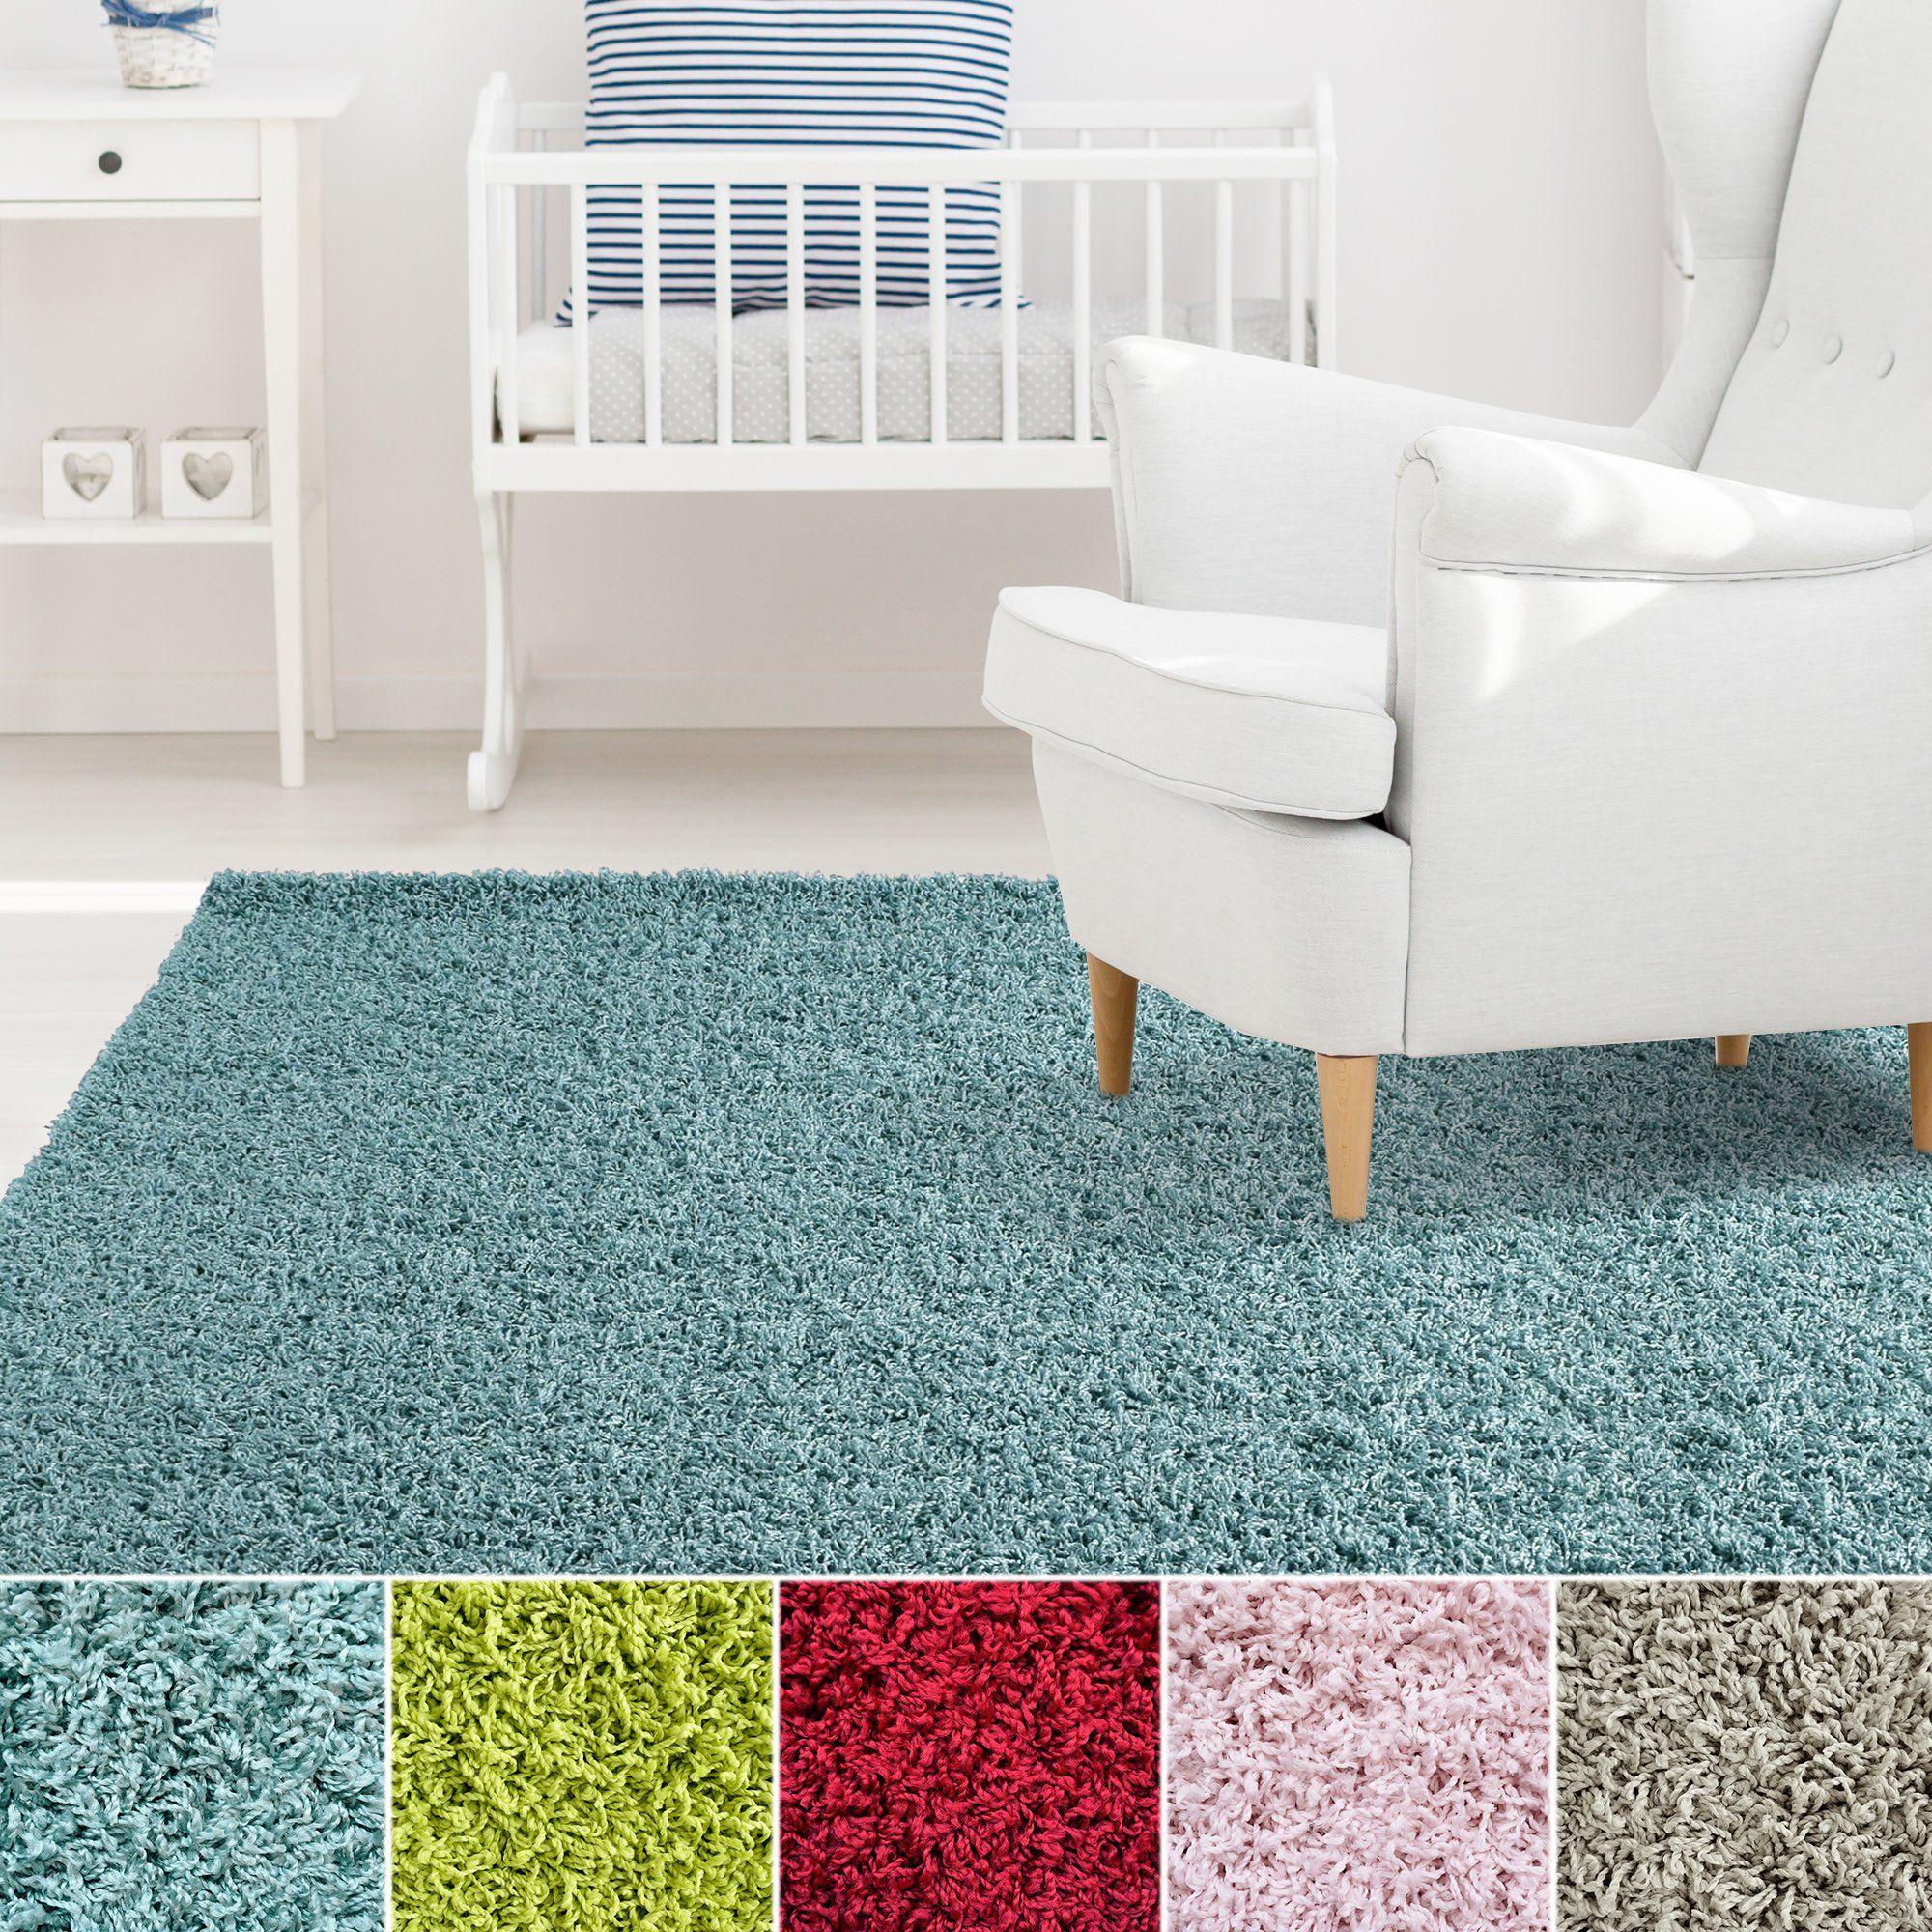 Full Size of Teppichboden Kinderzimmer Soft Teppich Grn Sofa Regal Weiß Regale Kinderzimmer Teppichboden Kinderzimmer